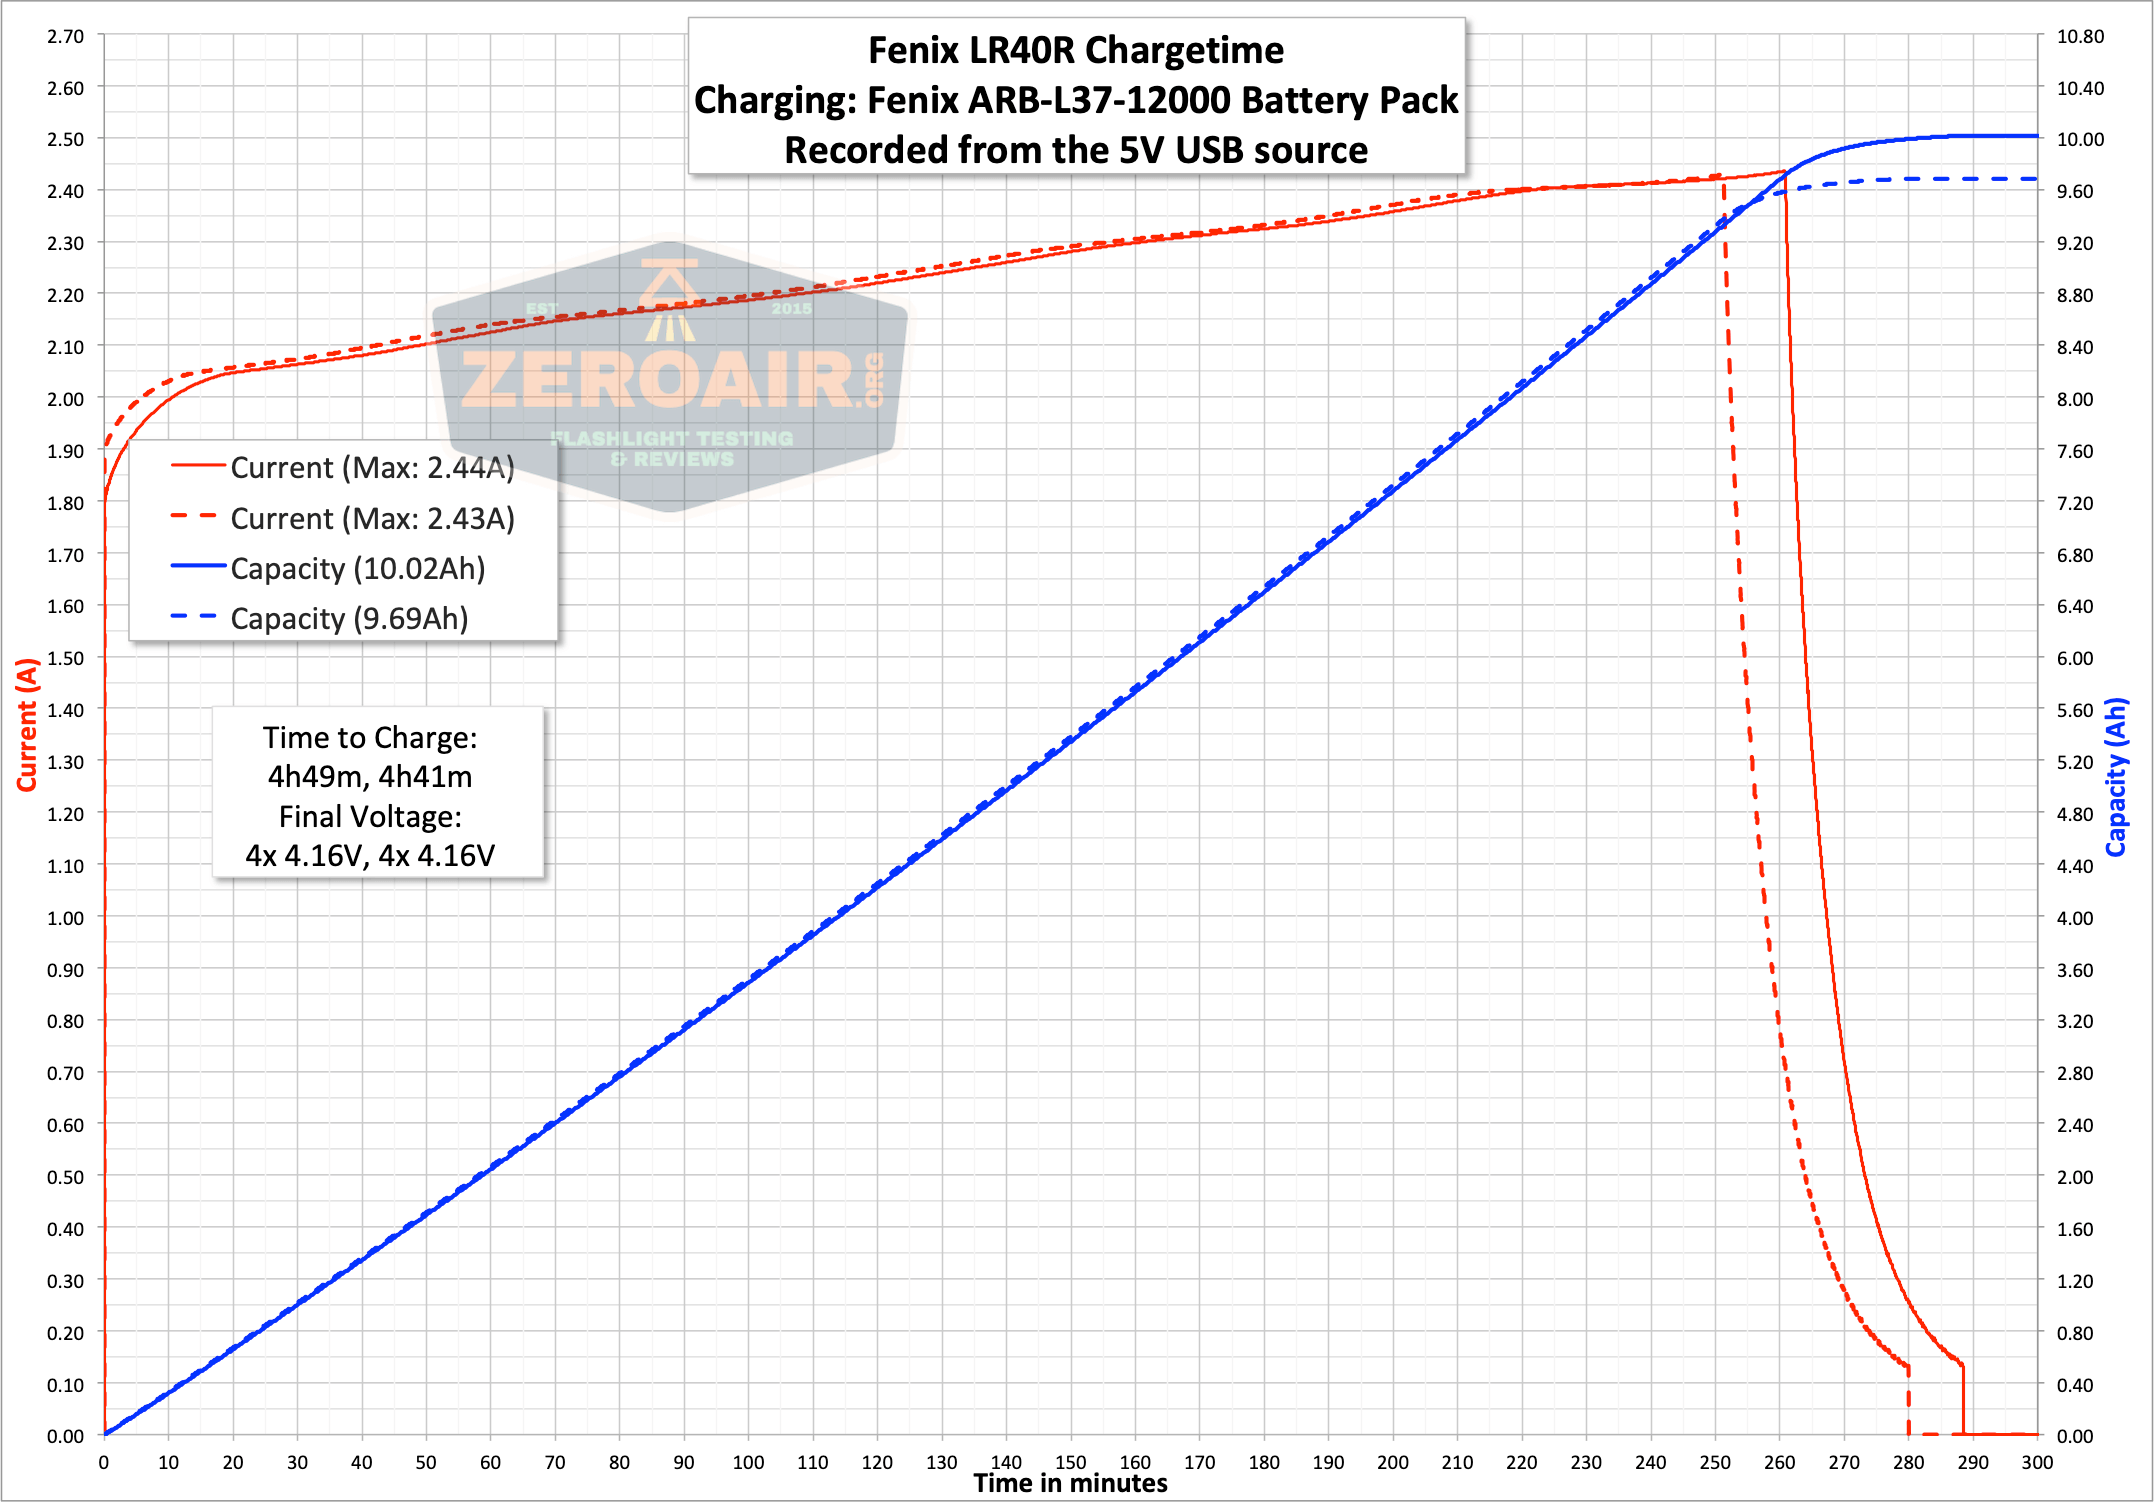 fenix lr40r charge graph 5V usb